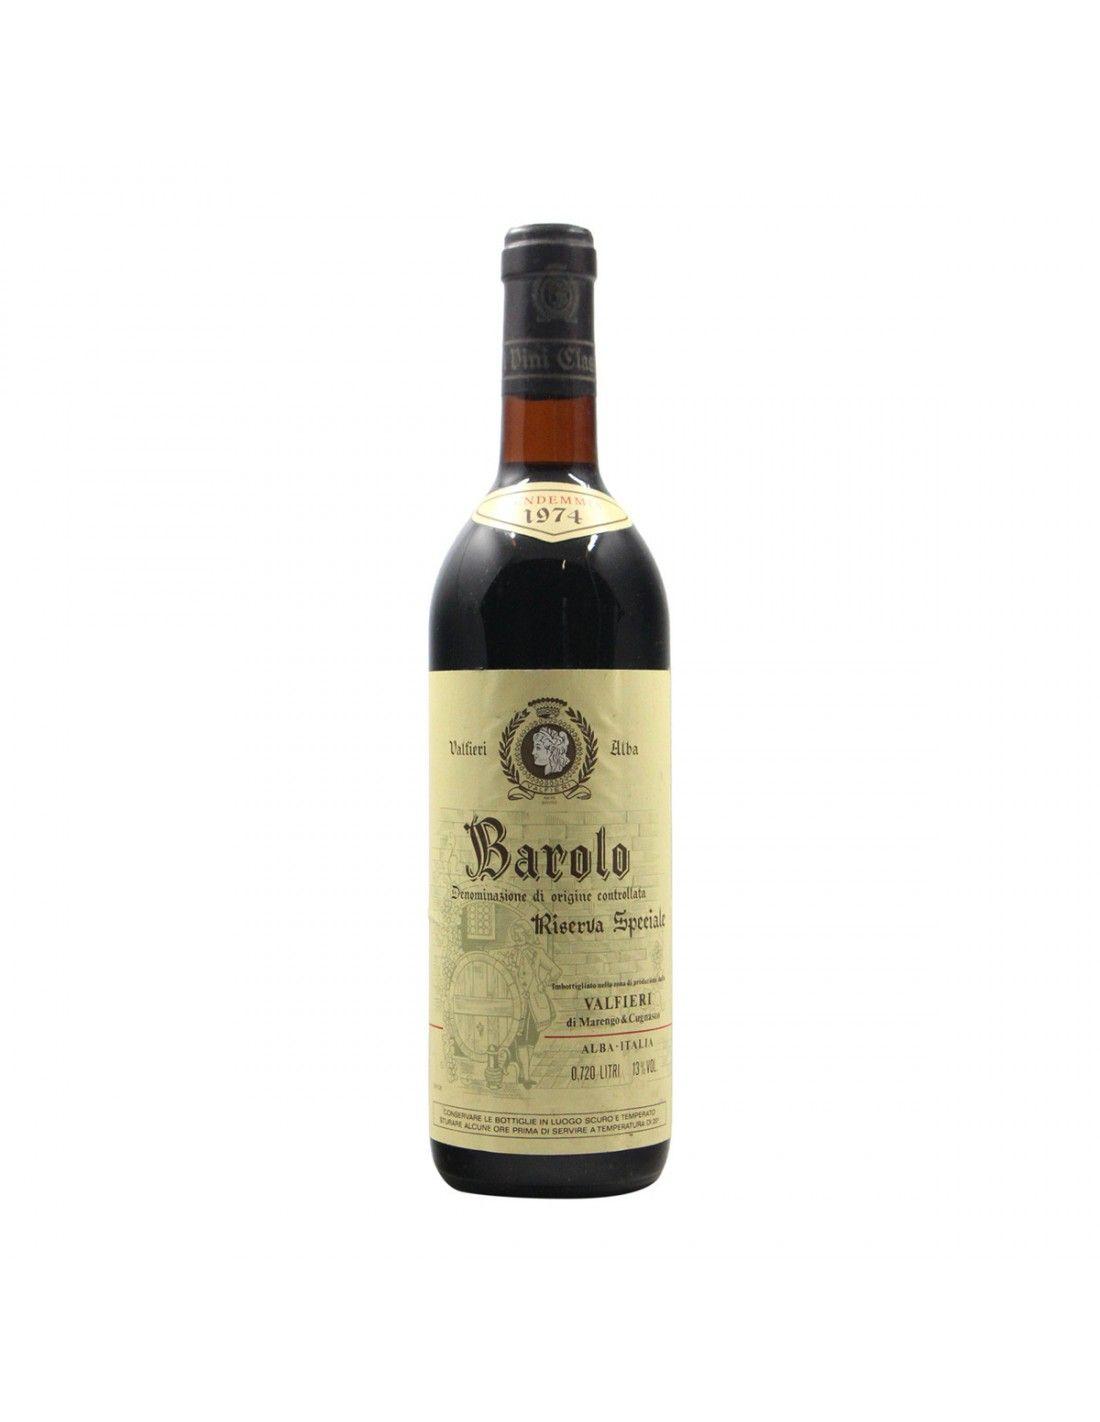 BAROLO RISERVA VALFIERI 1974 VALFIERI Grandi Bottiglie